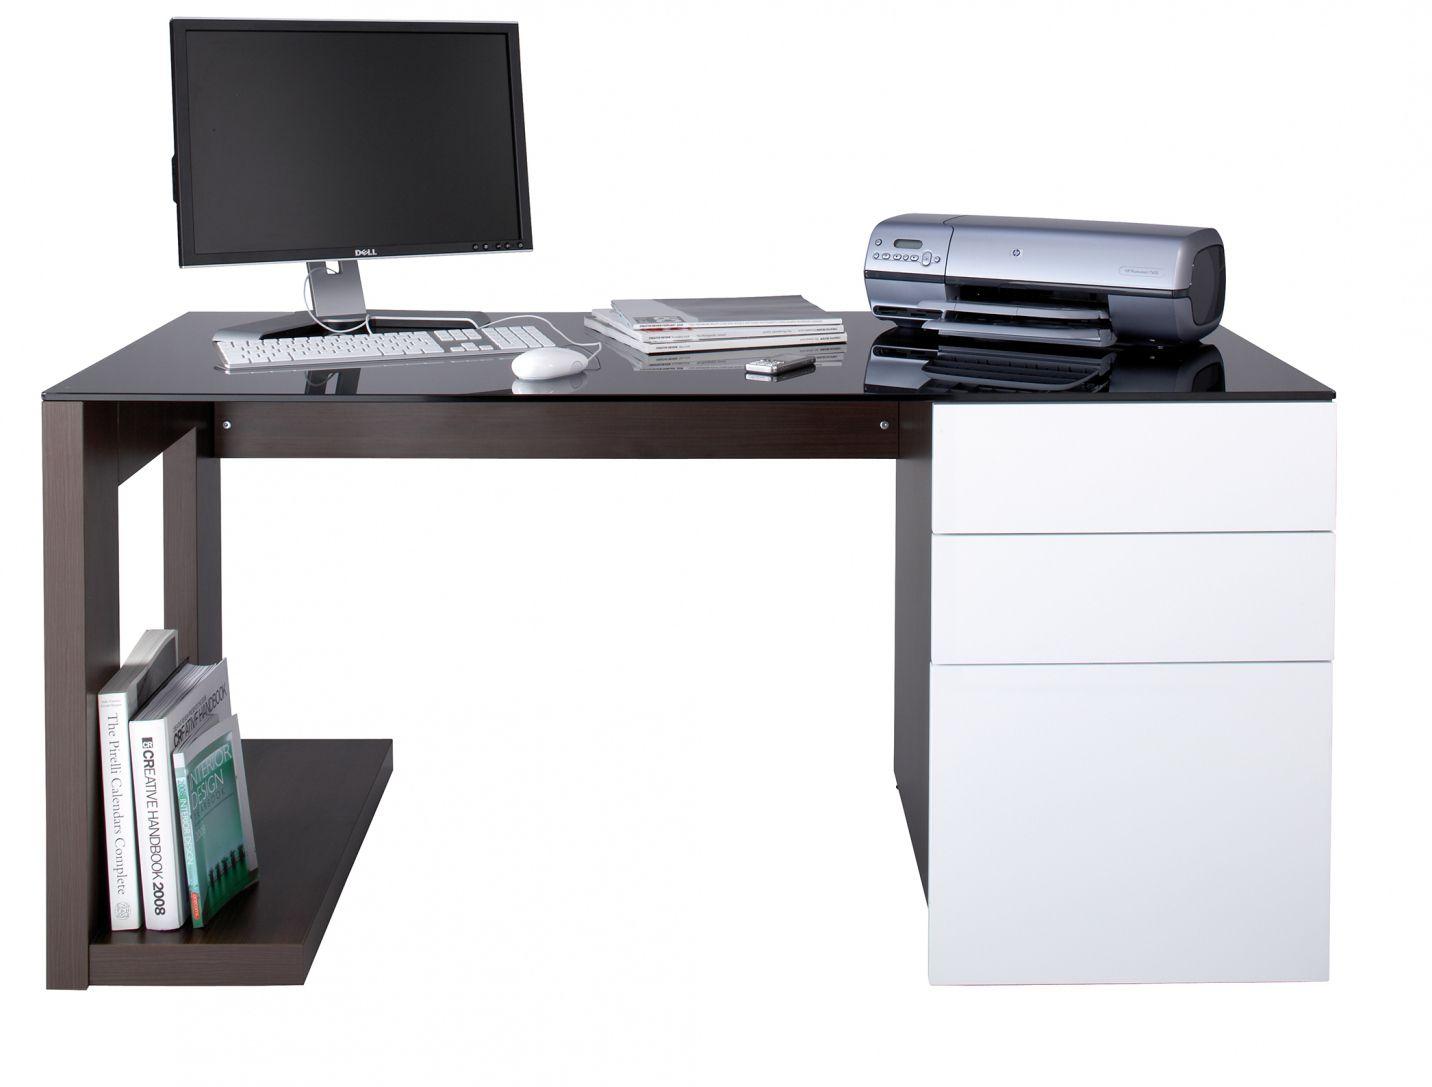 Modern Computer Desk Designs Best Home Office Furniture Check More At Http Michael Malarkey Com Modern Computer Desk Designs